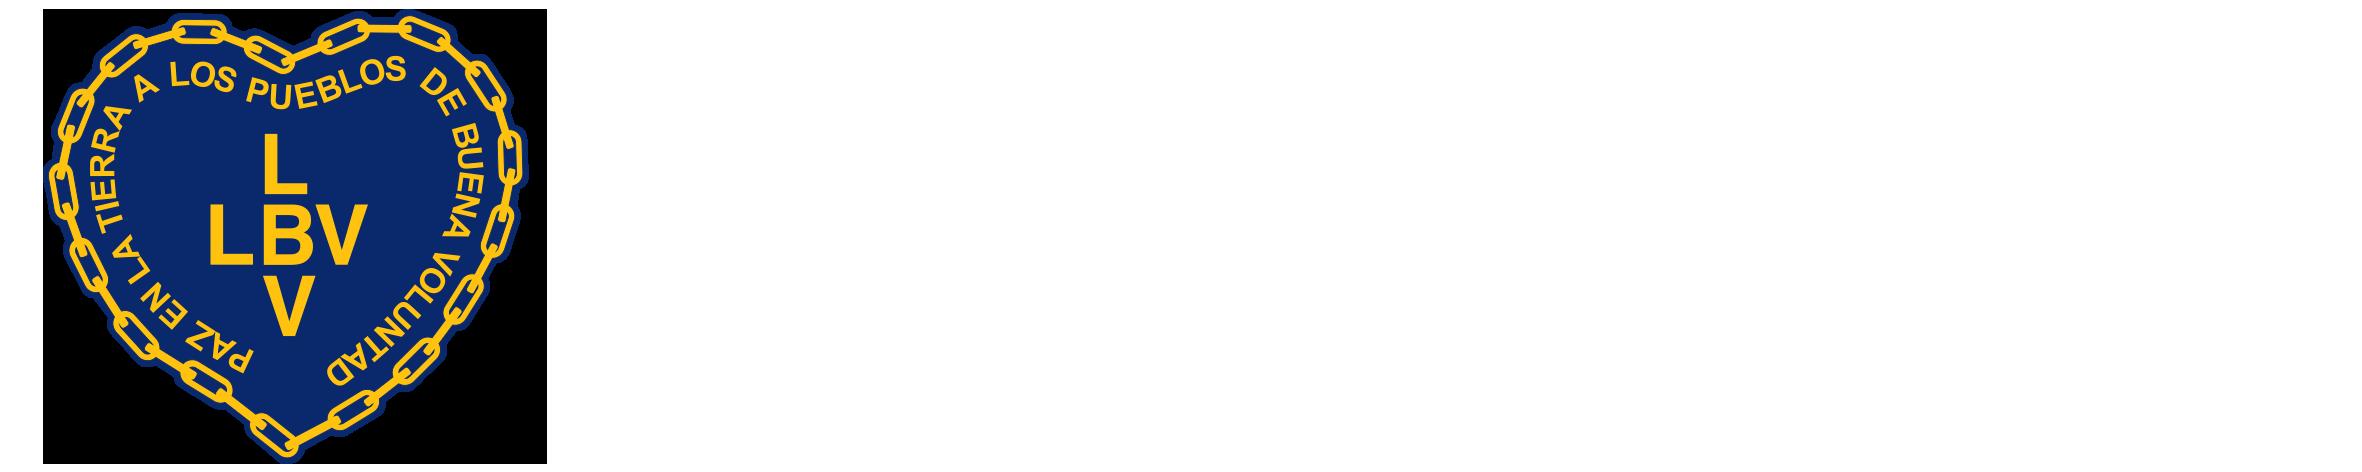 LBV Uruguay